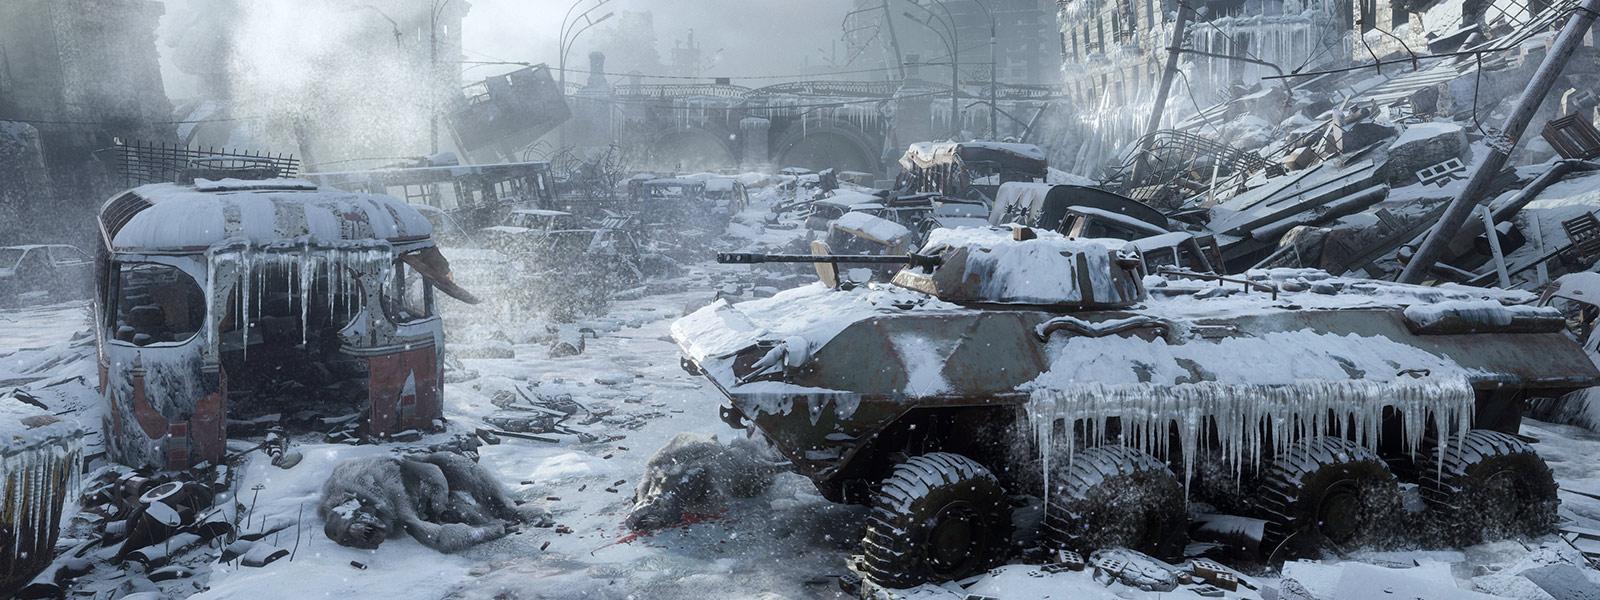 Vereister Panzer in entvölkerter Stadt